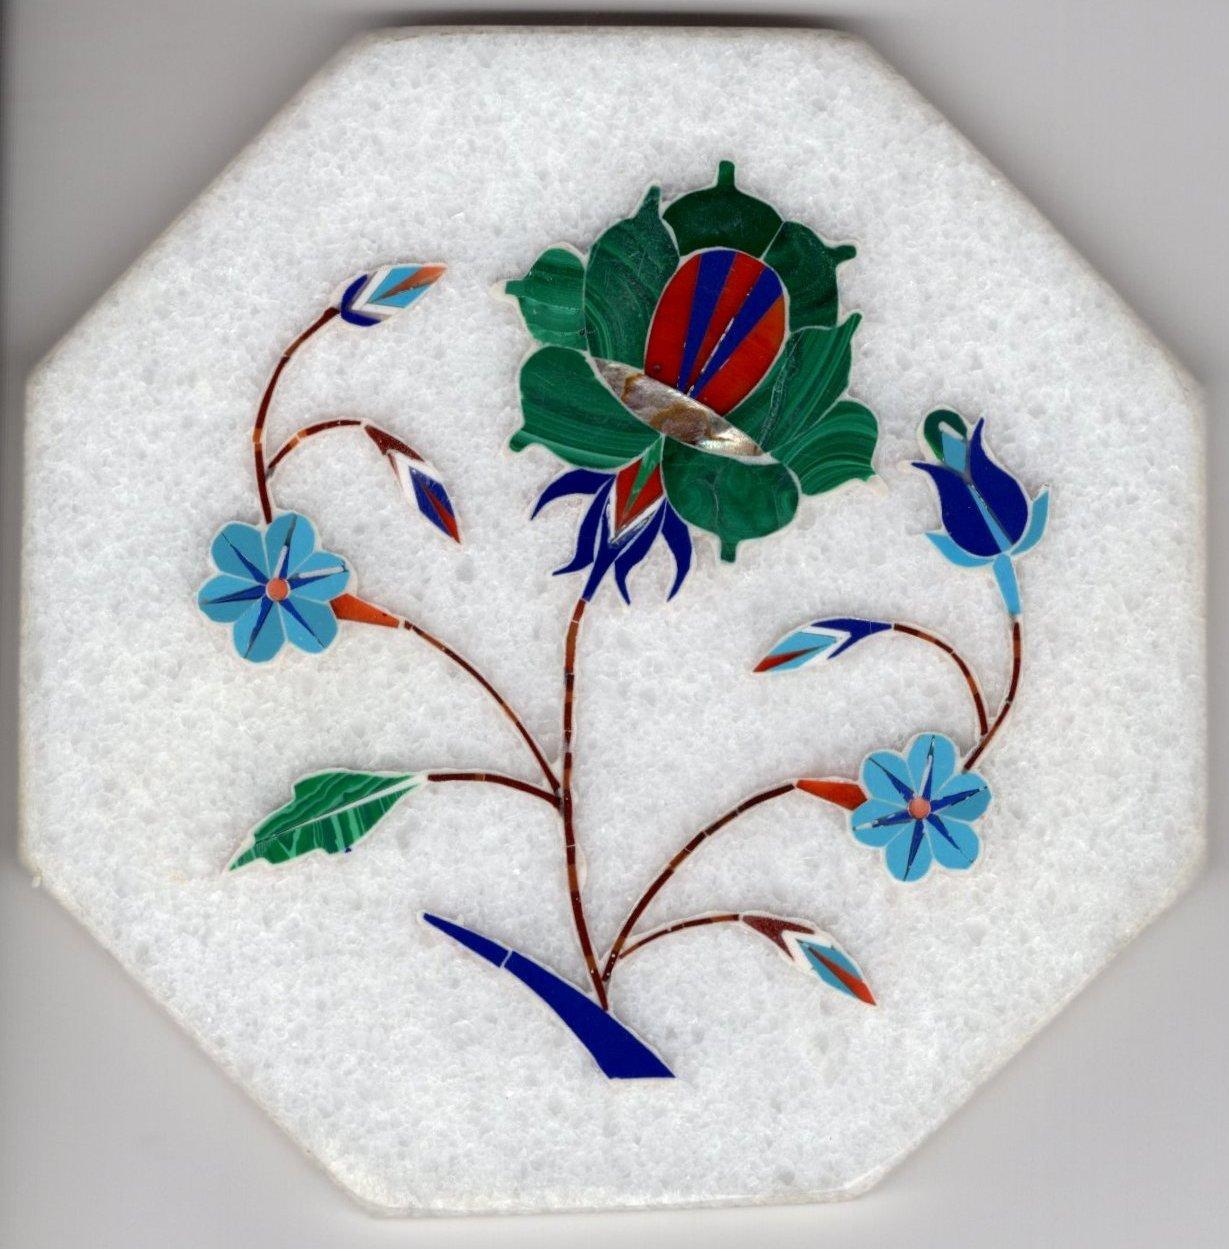 Parchin Kari Marble Inlay Art Handmade 4� Floral Mosaic Indian Home Decor Art